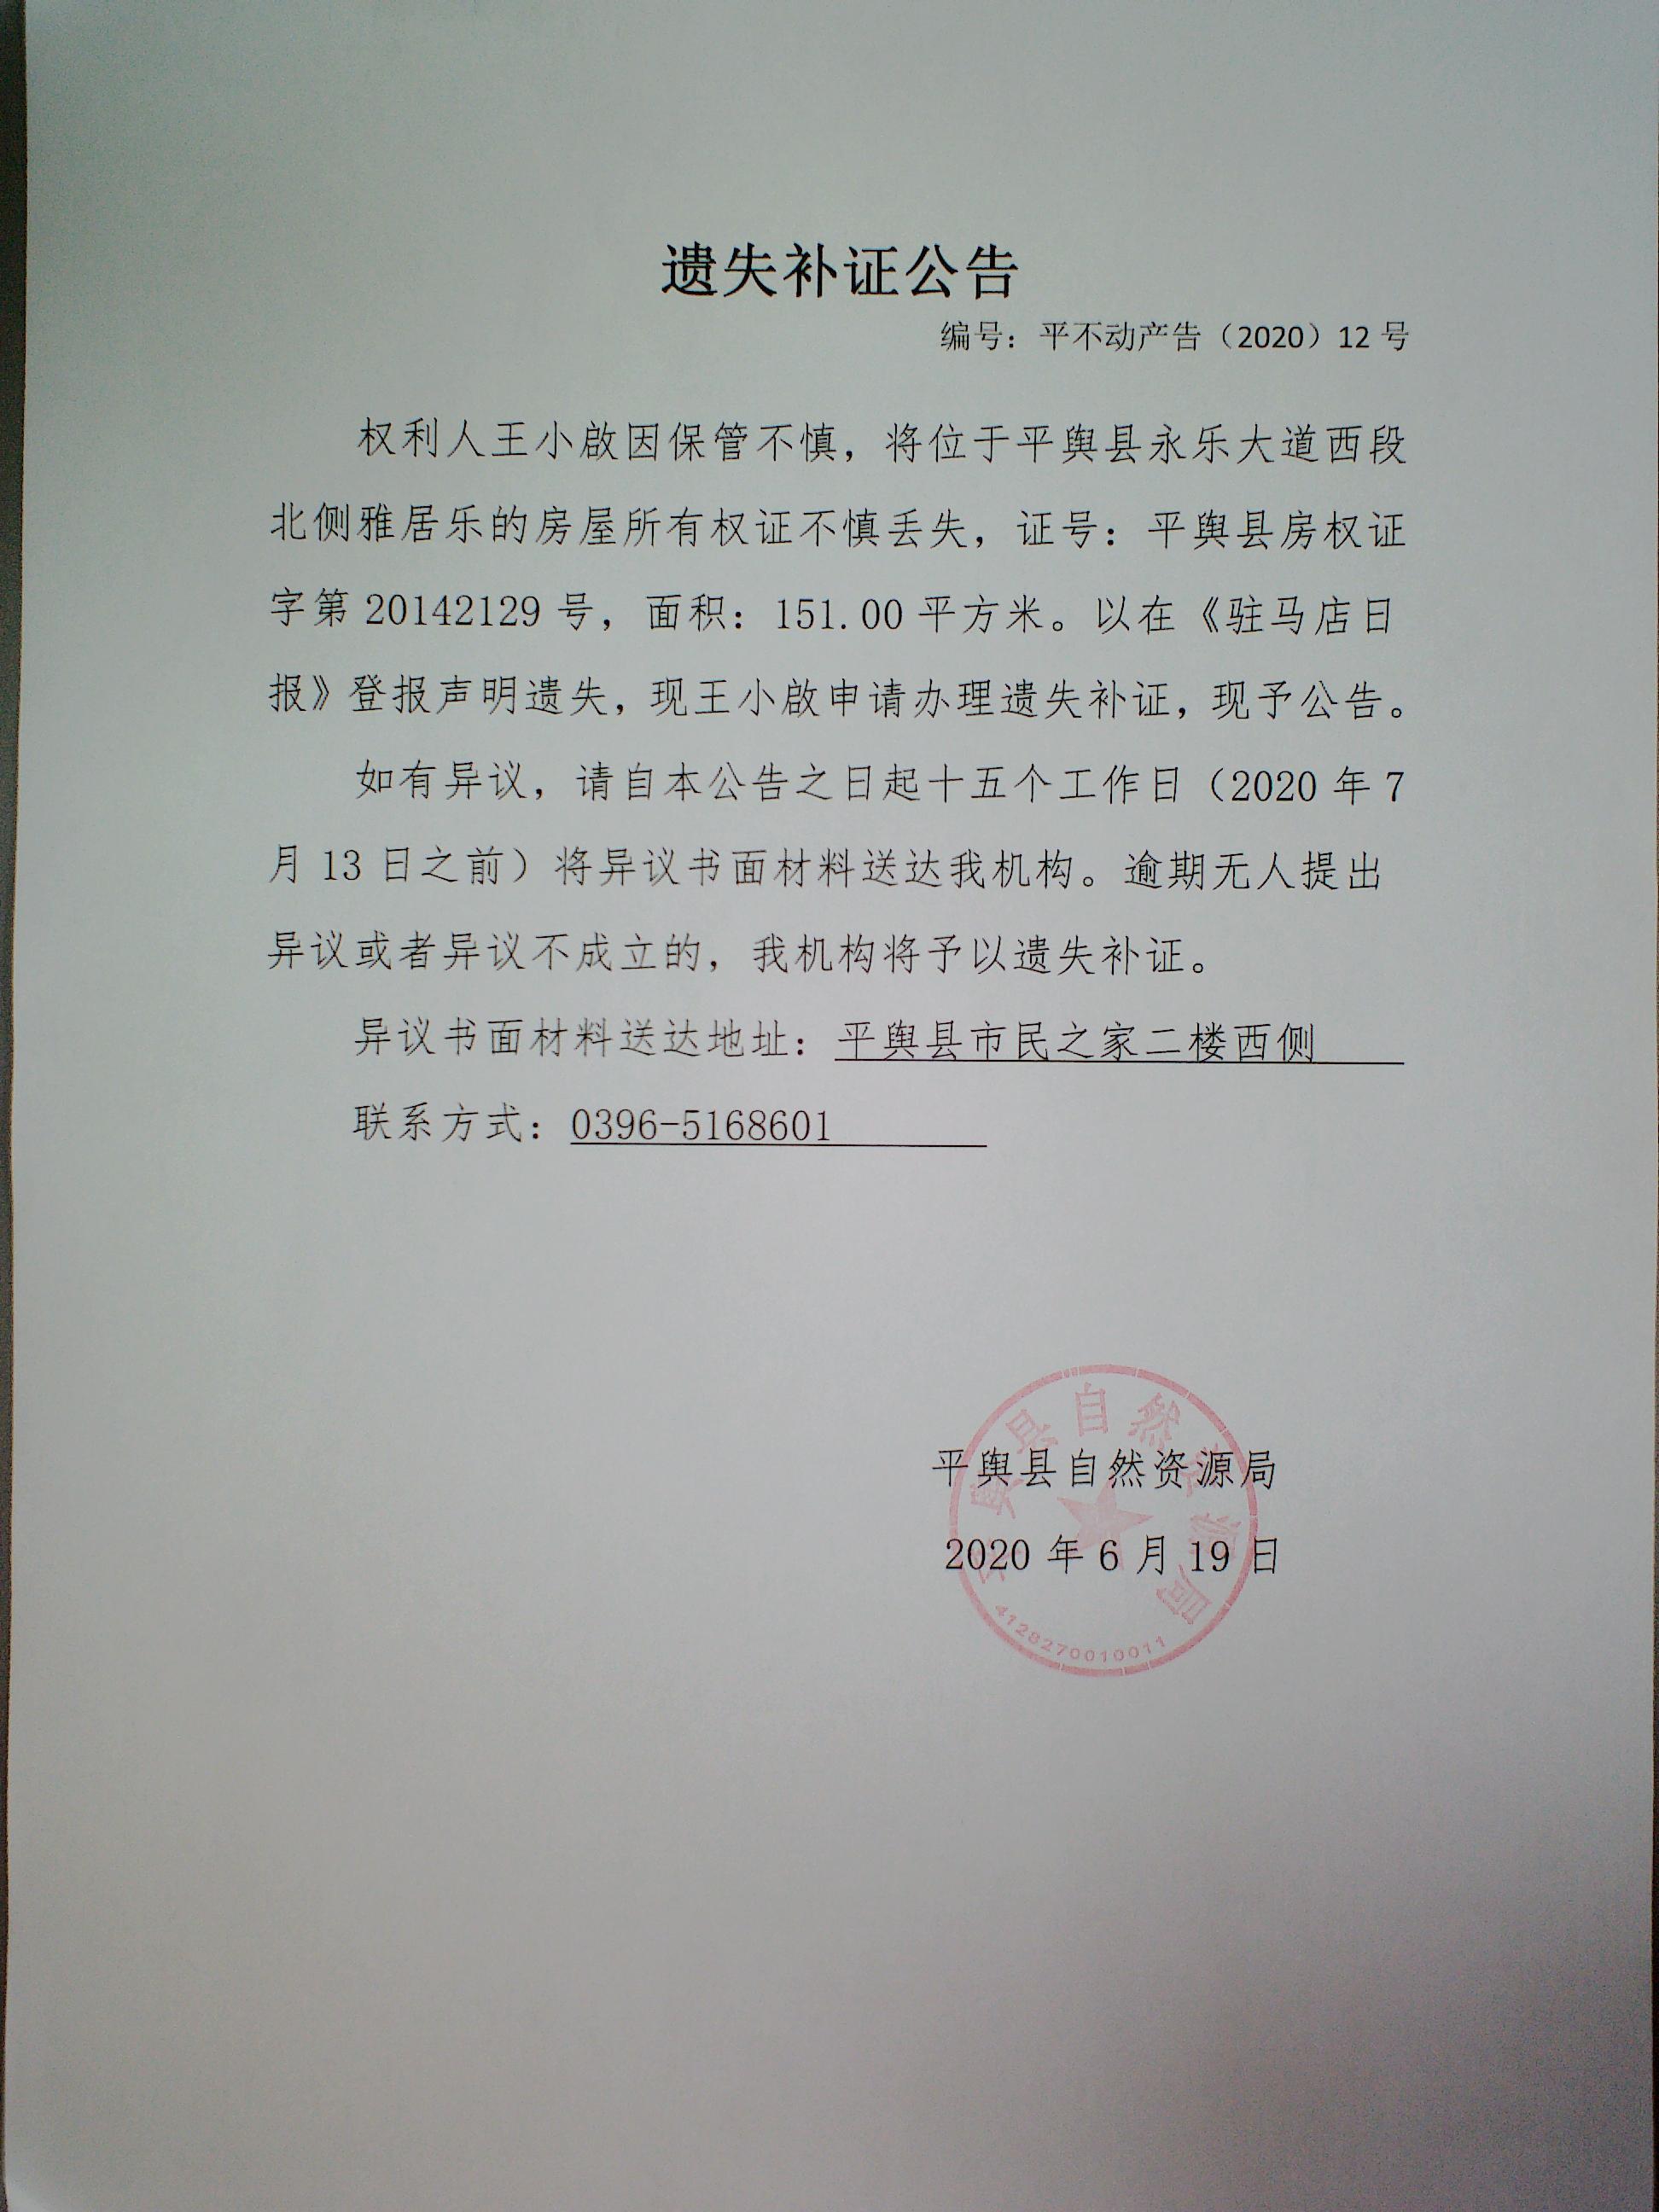 http://zyz.pingyu.gov.cn//5417dc3f9a05c212395f5e99/202006/2020062909151355_X6JgoPYW.jpg